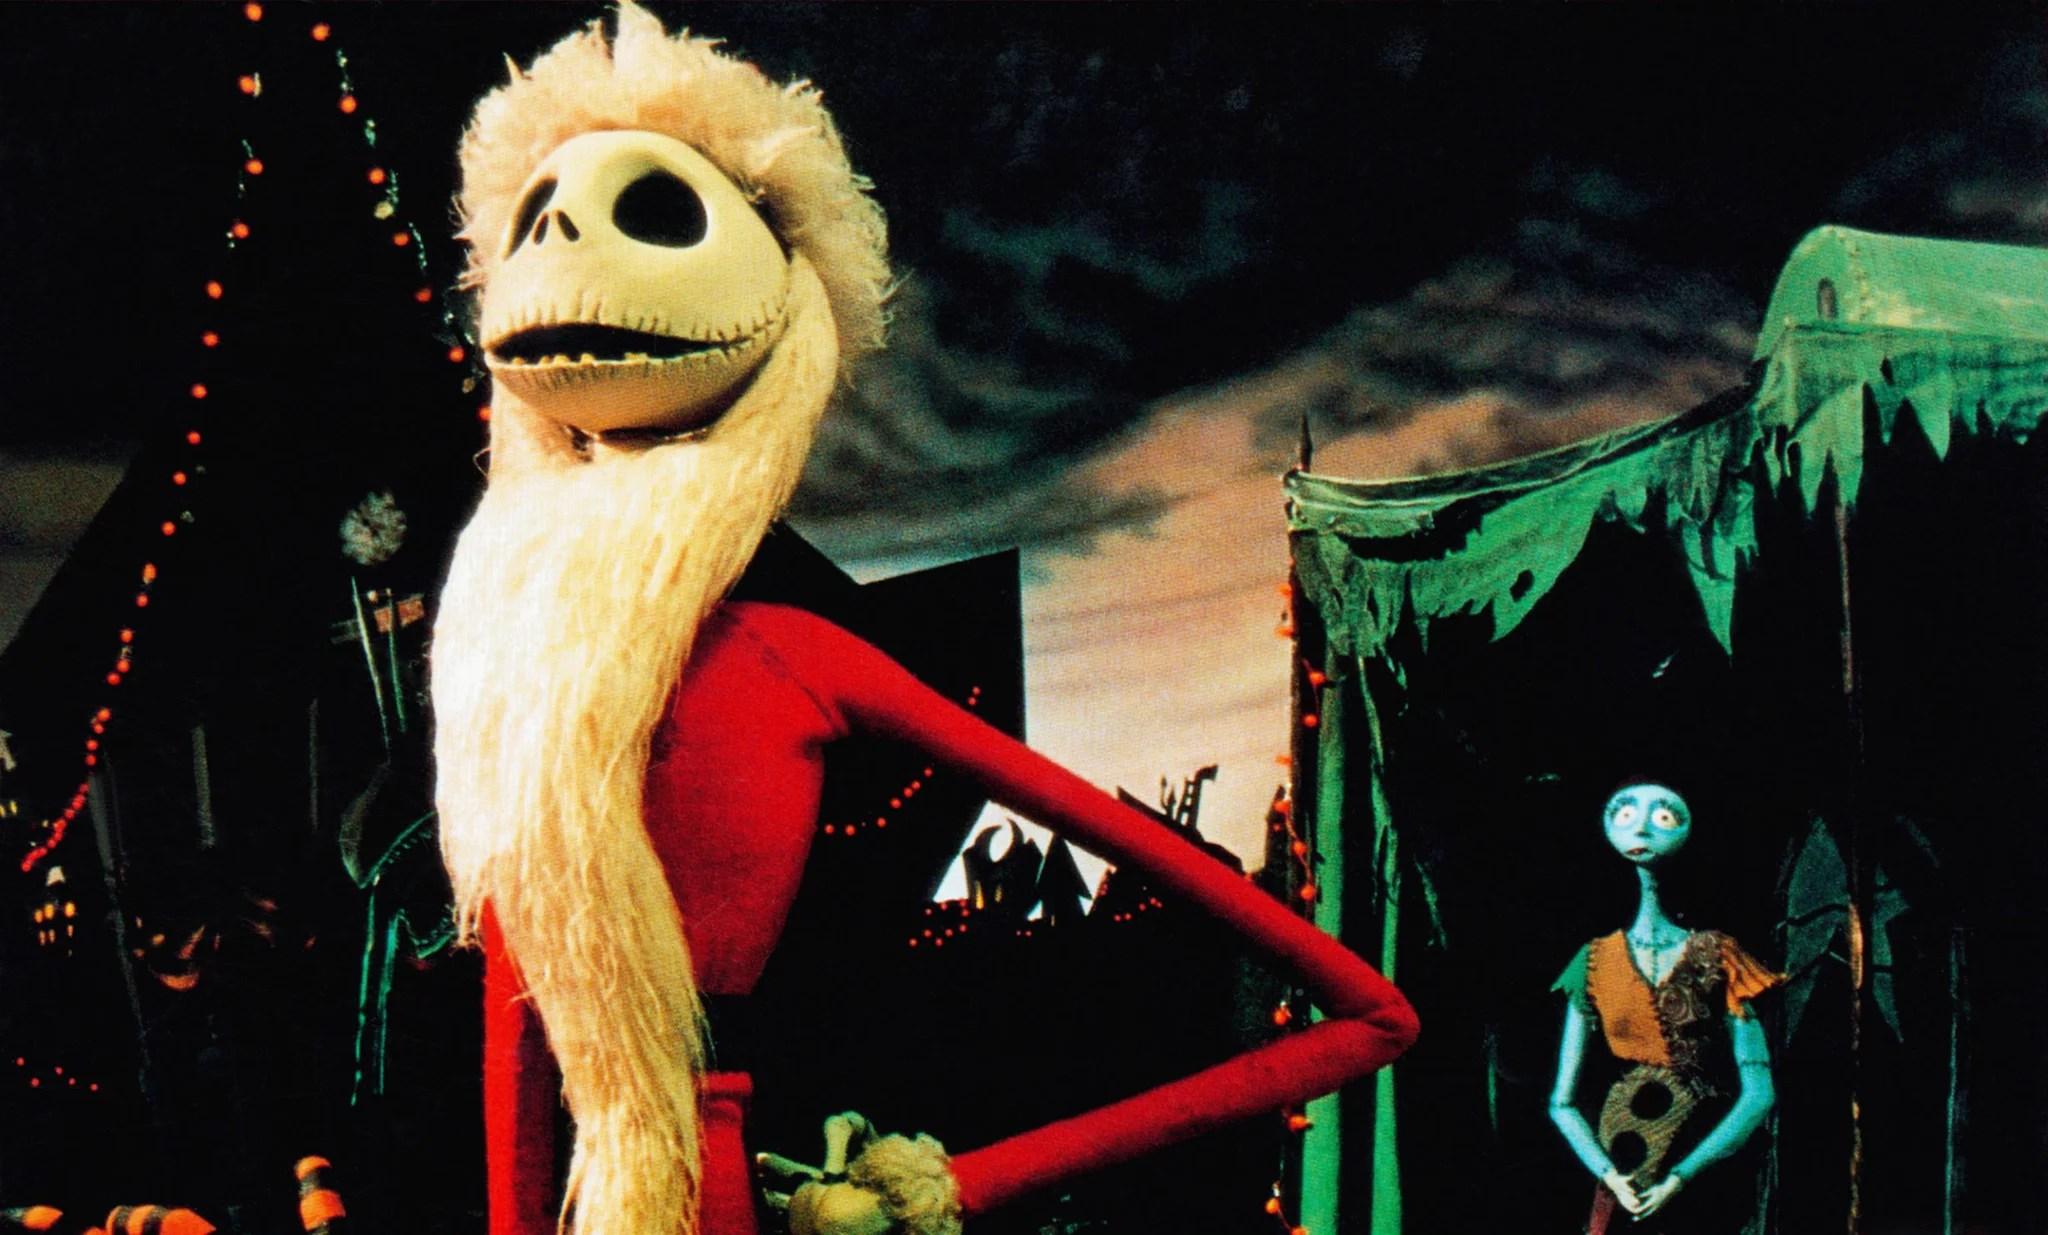 Is Nightmare Before Christmas a Halloween or Christmas